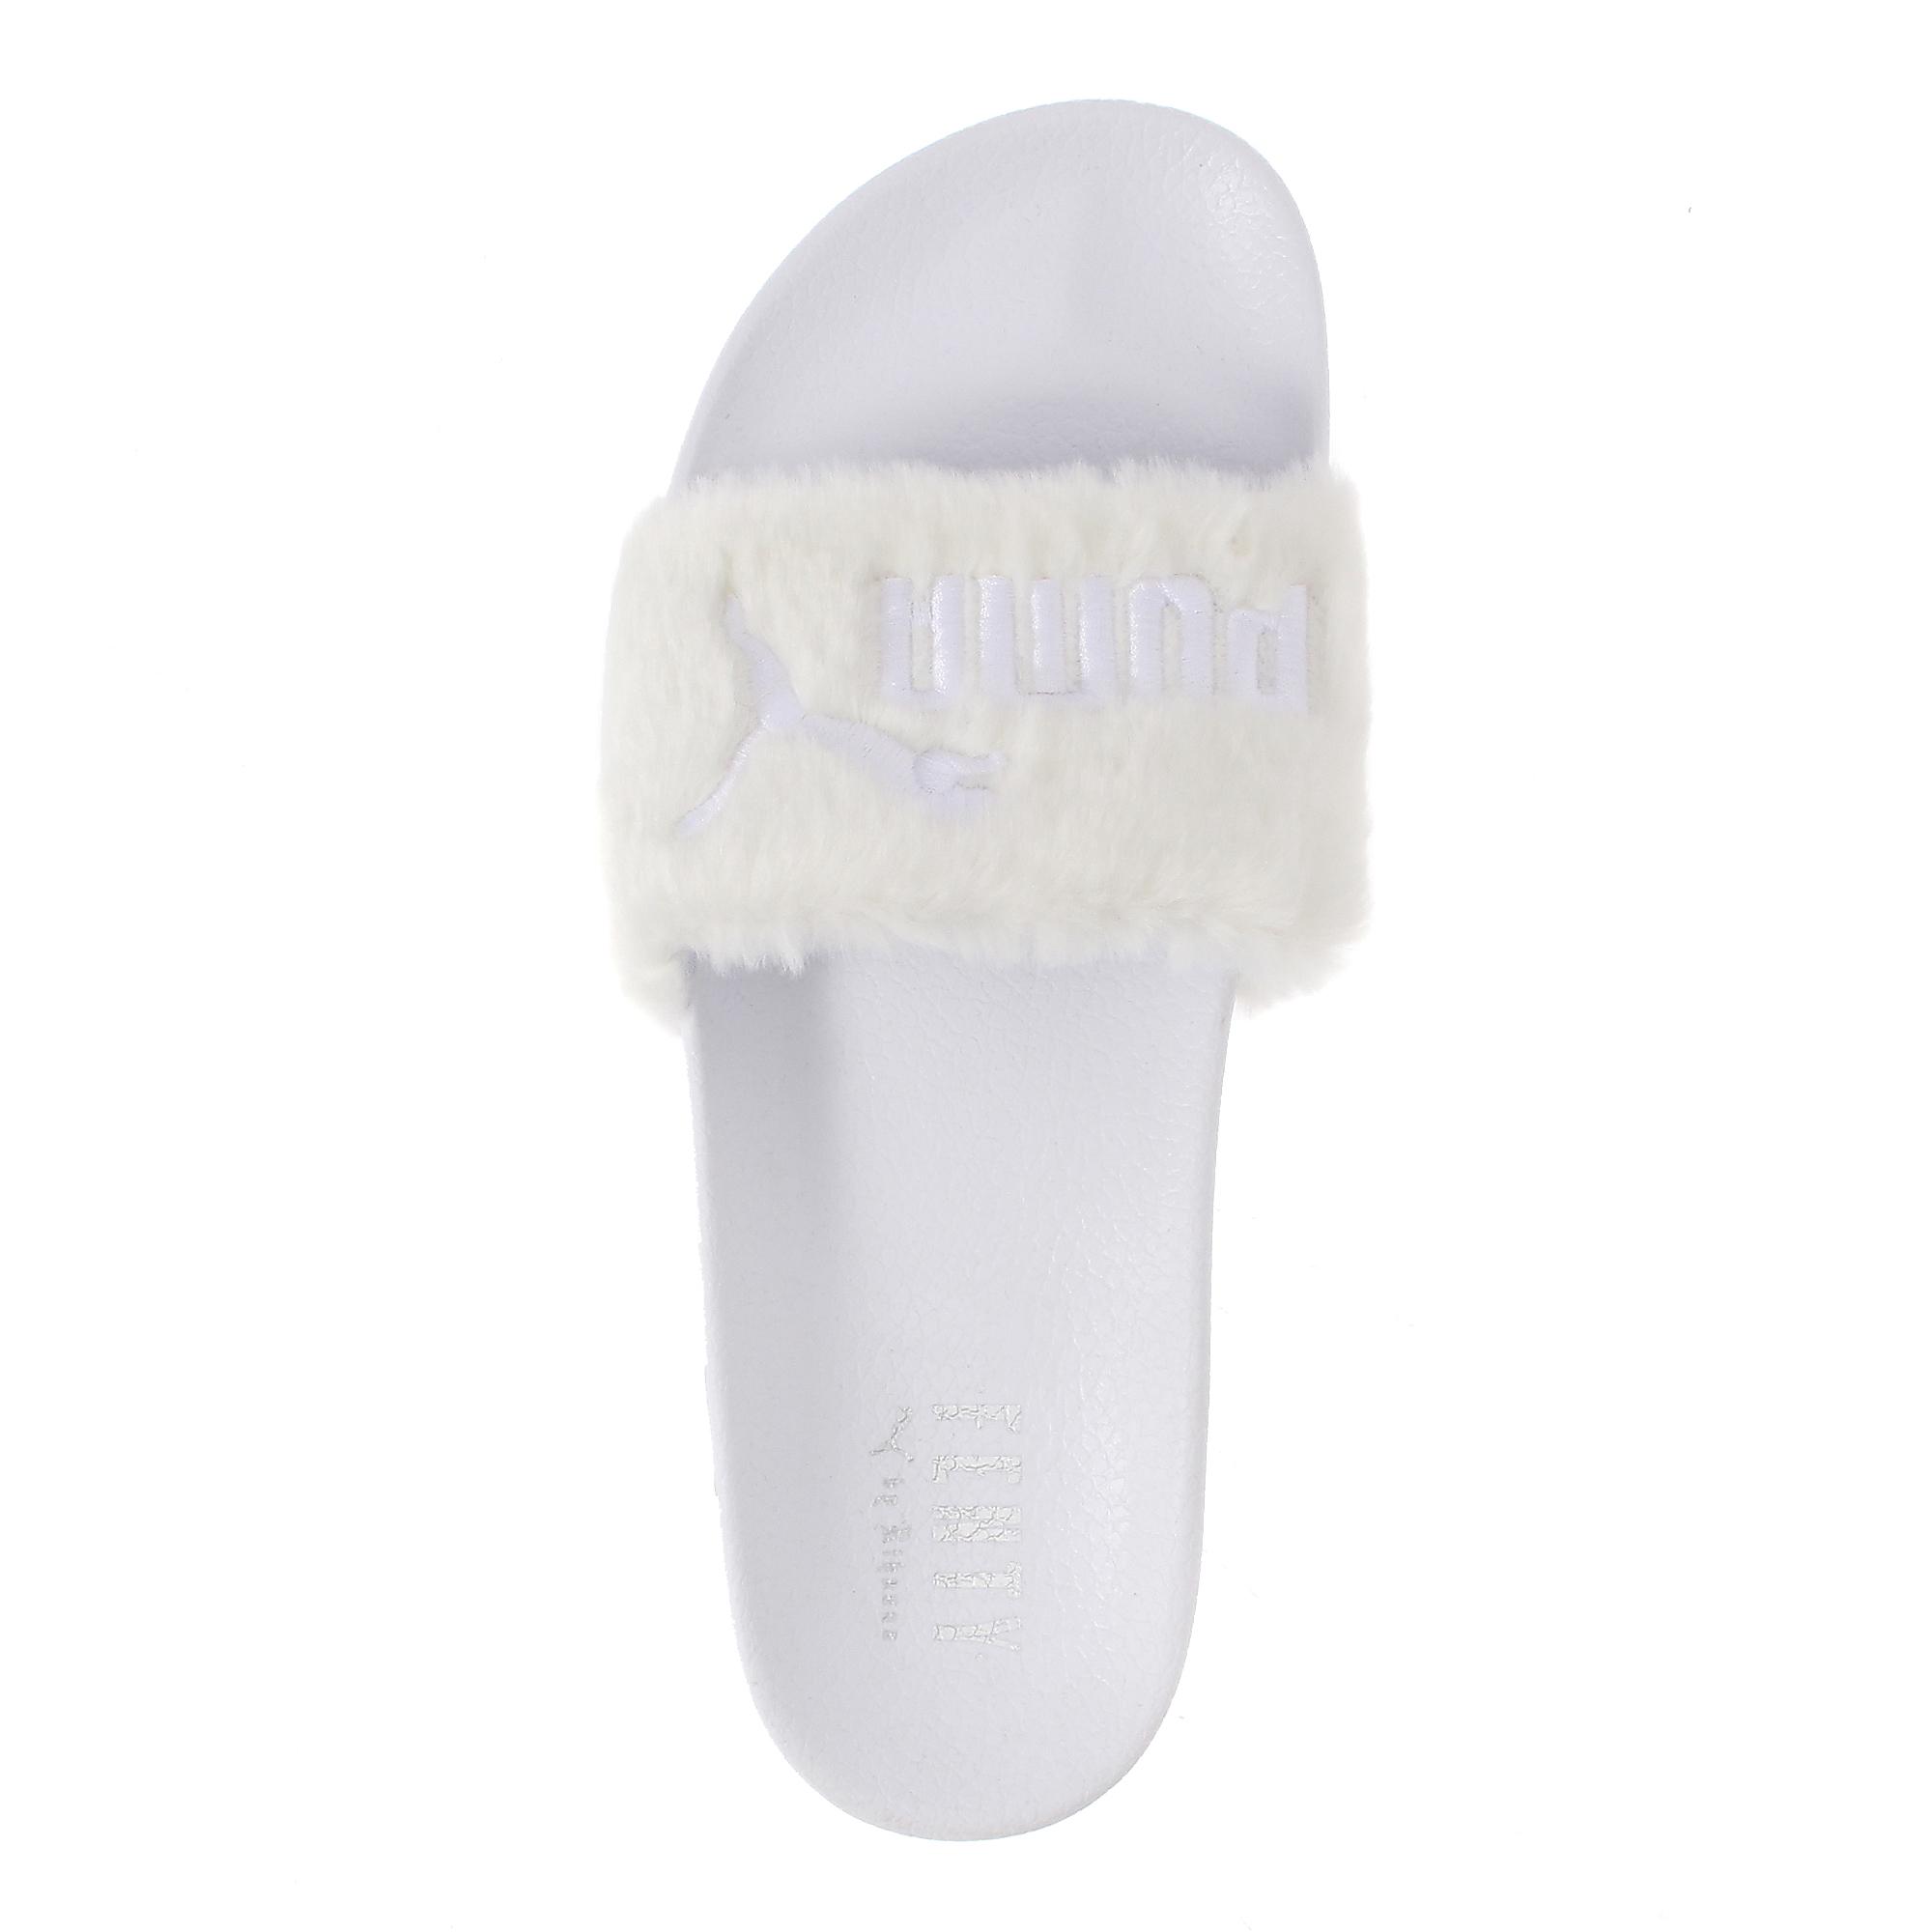 the best attitude 116fe 29c67 Rihanna Puma Fur Slides | Rihanna Puma Fur Sandals | PUMA ...